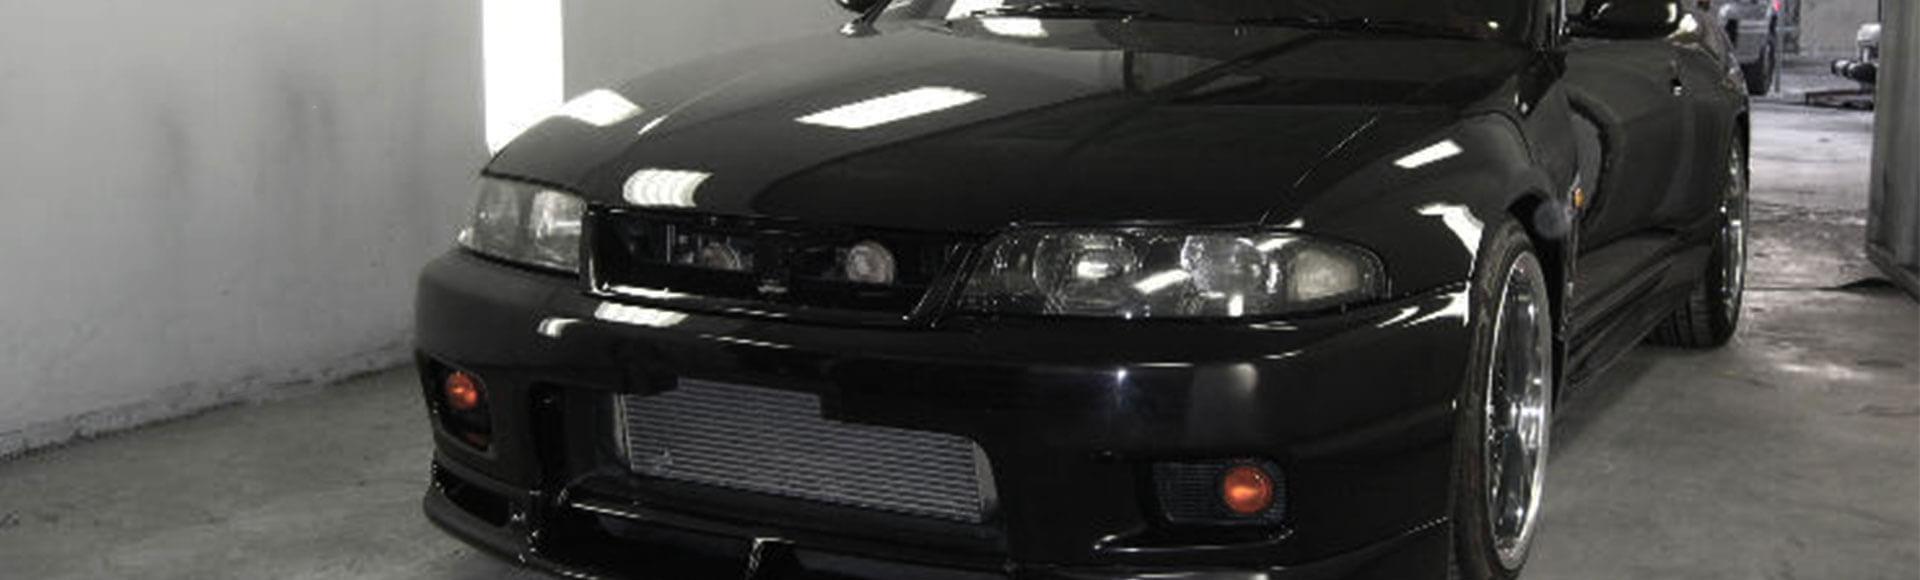 Modern black car picture